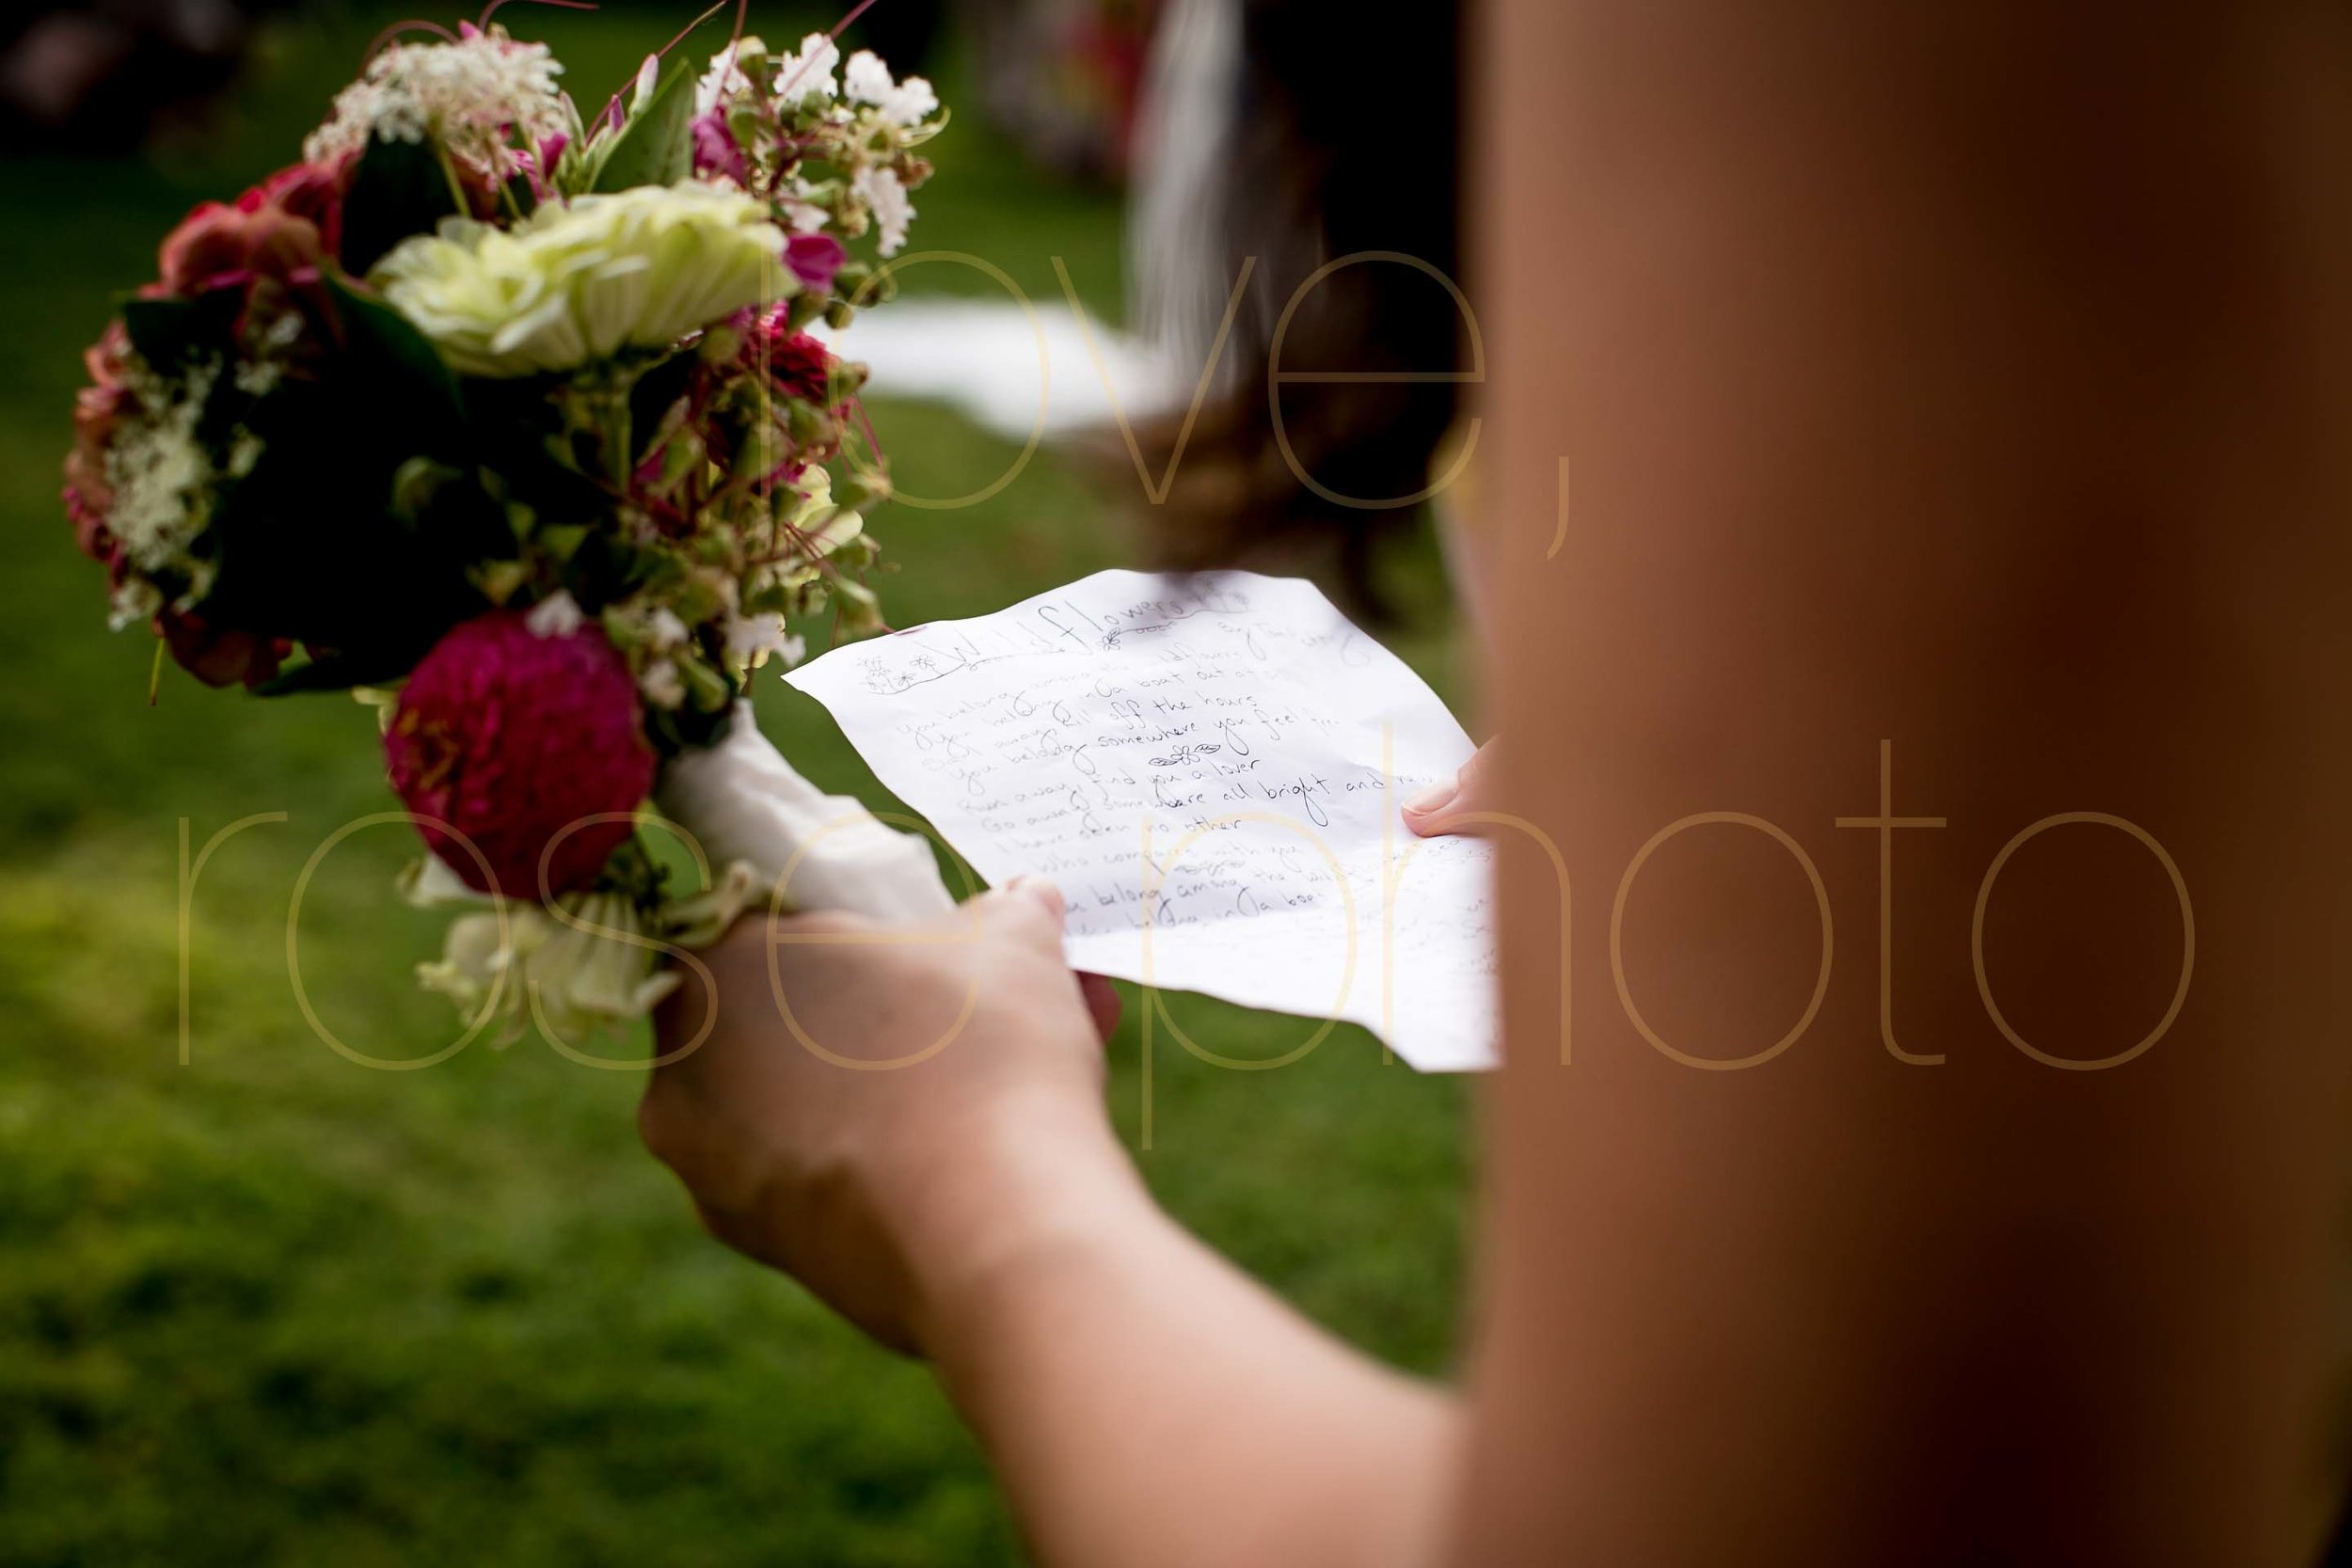 Rose Photo Asheville Wedding Photographer Nasheville Weddings Charleston Bride Chicago photojournalist weddings -39.jpg